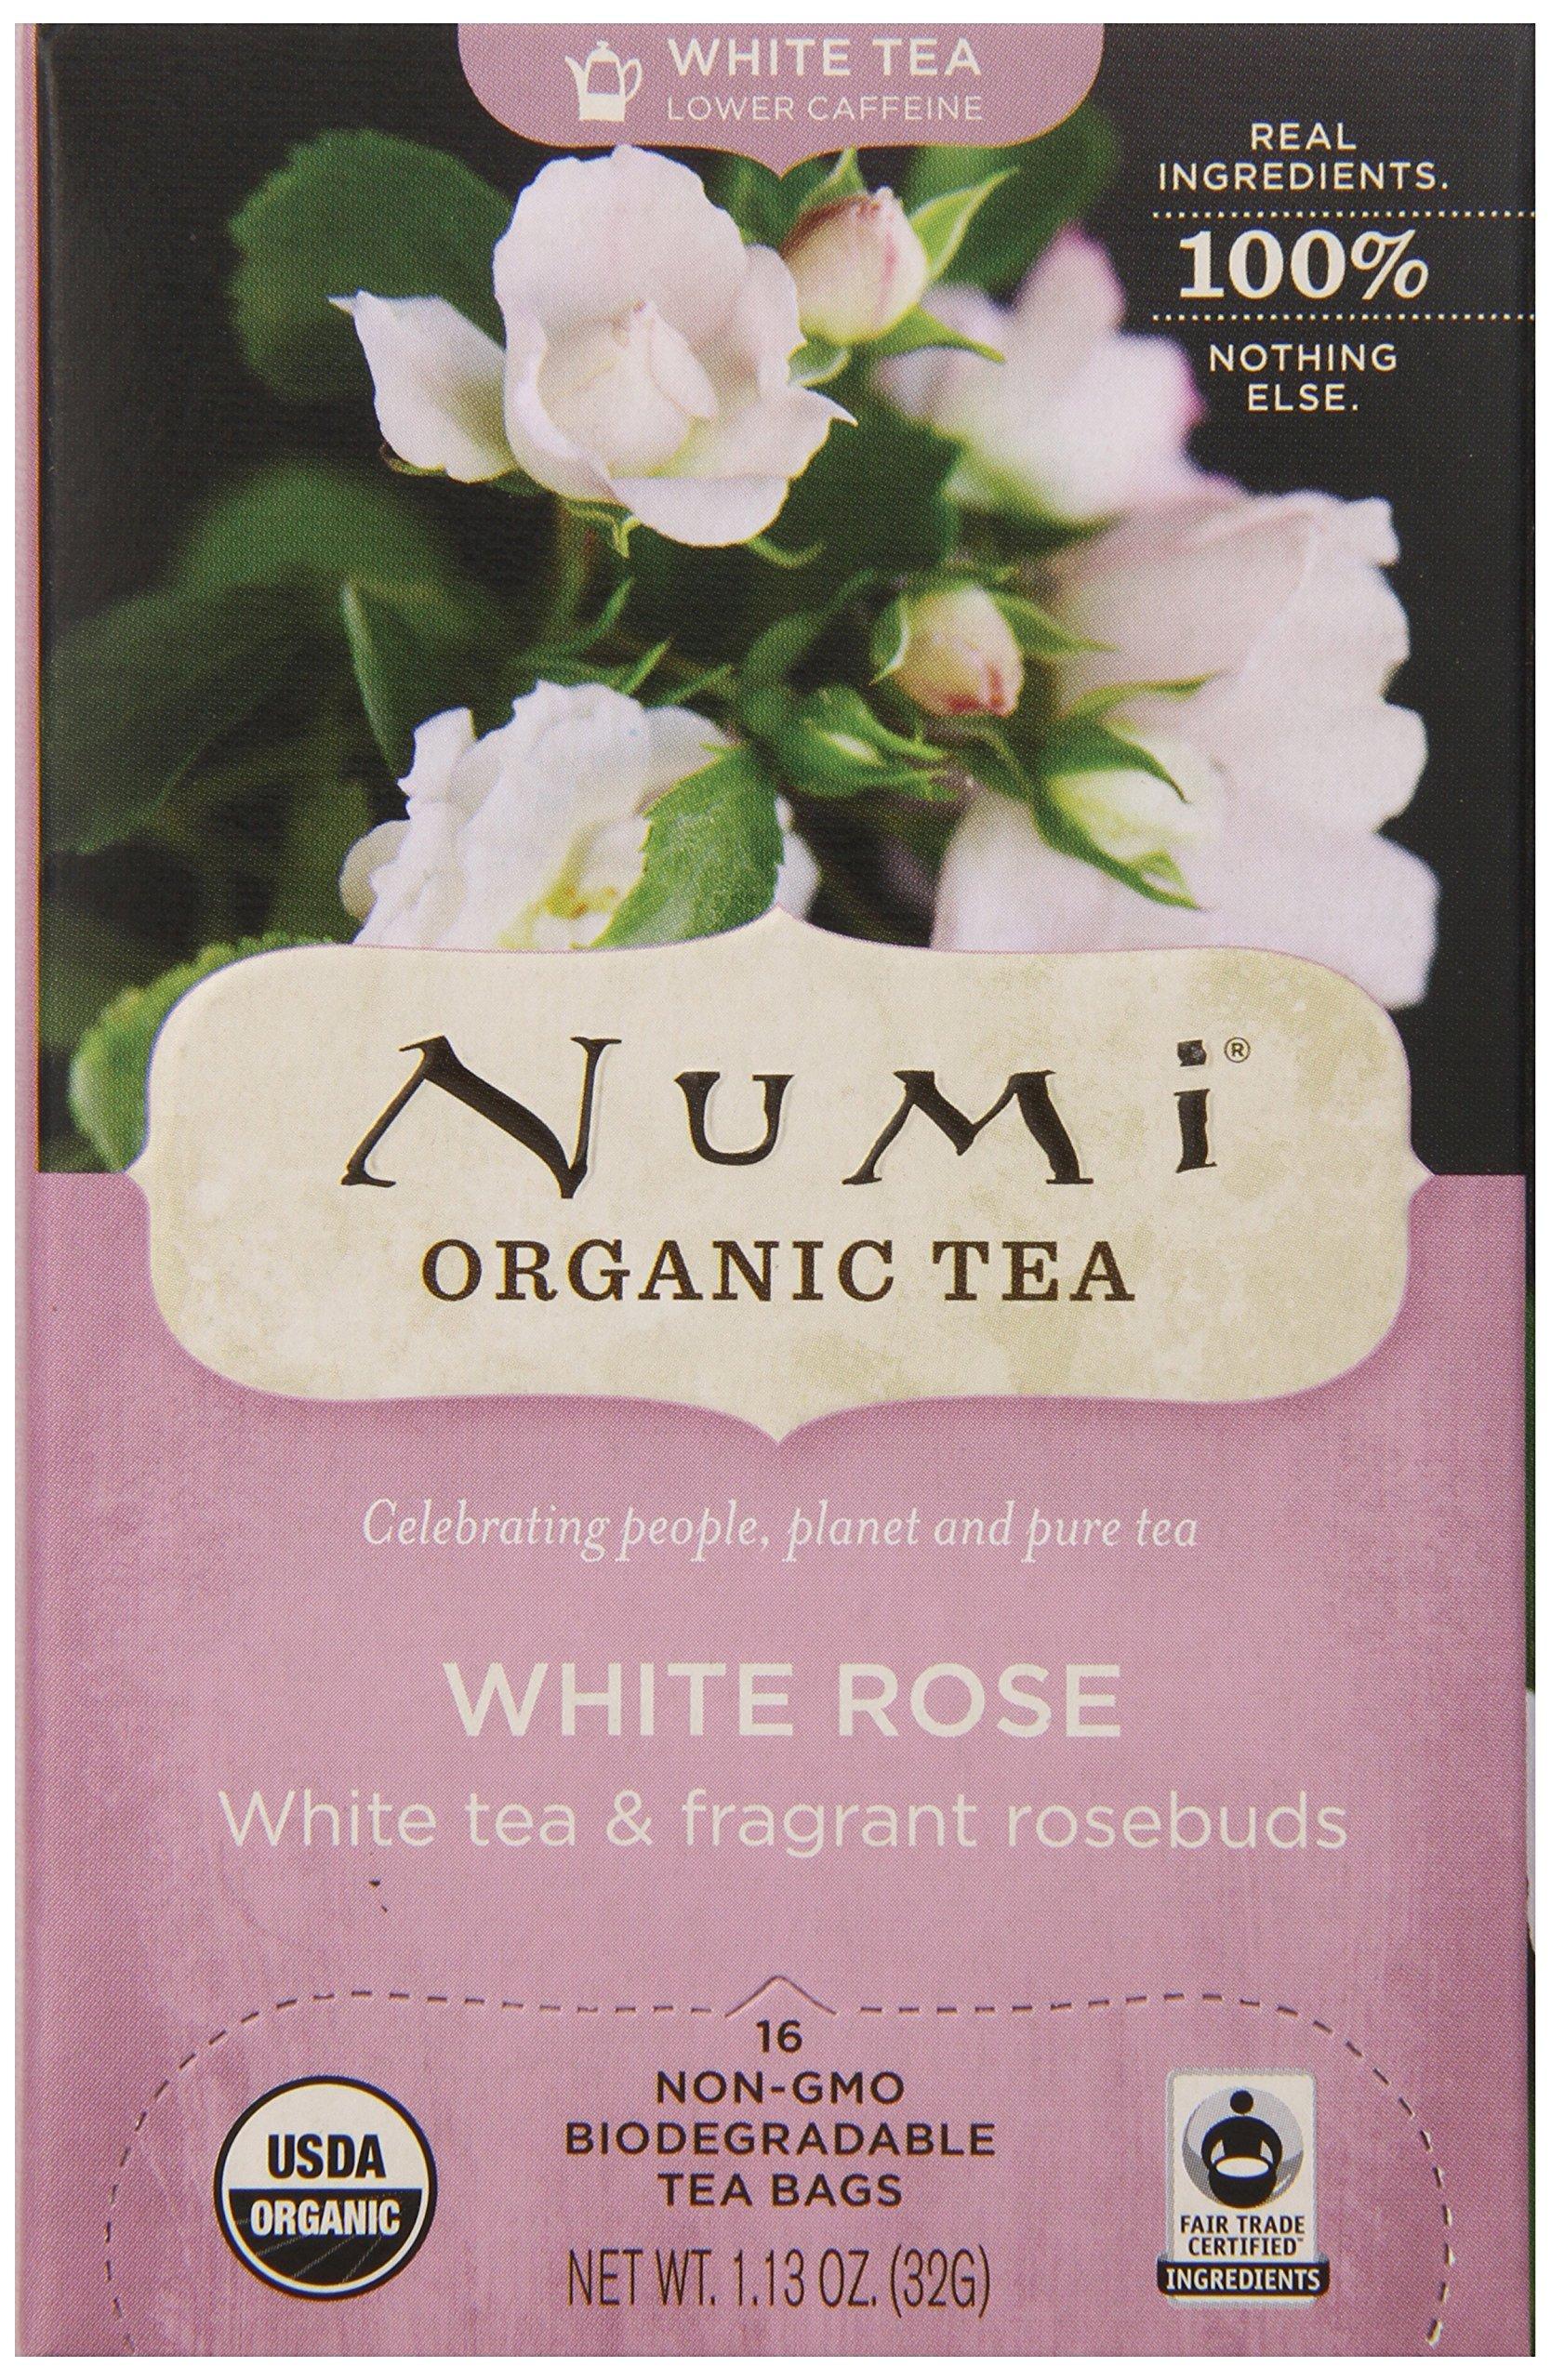 Numi Organic Tea White Rose - Full Leaf White Tea in Teabags, 16-Count (Pack of 6)